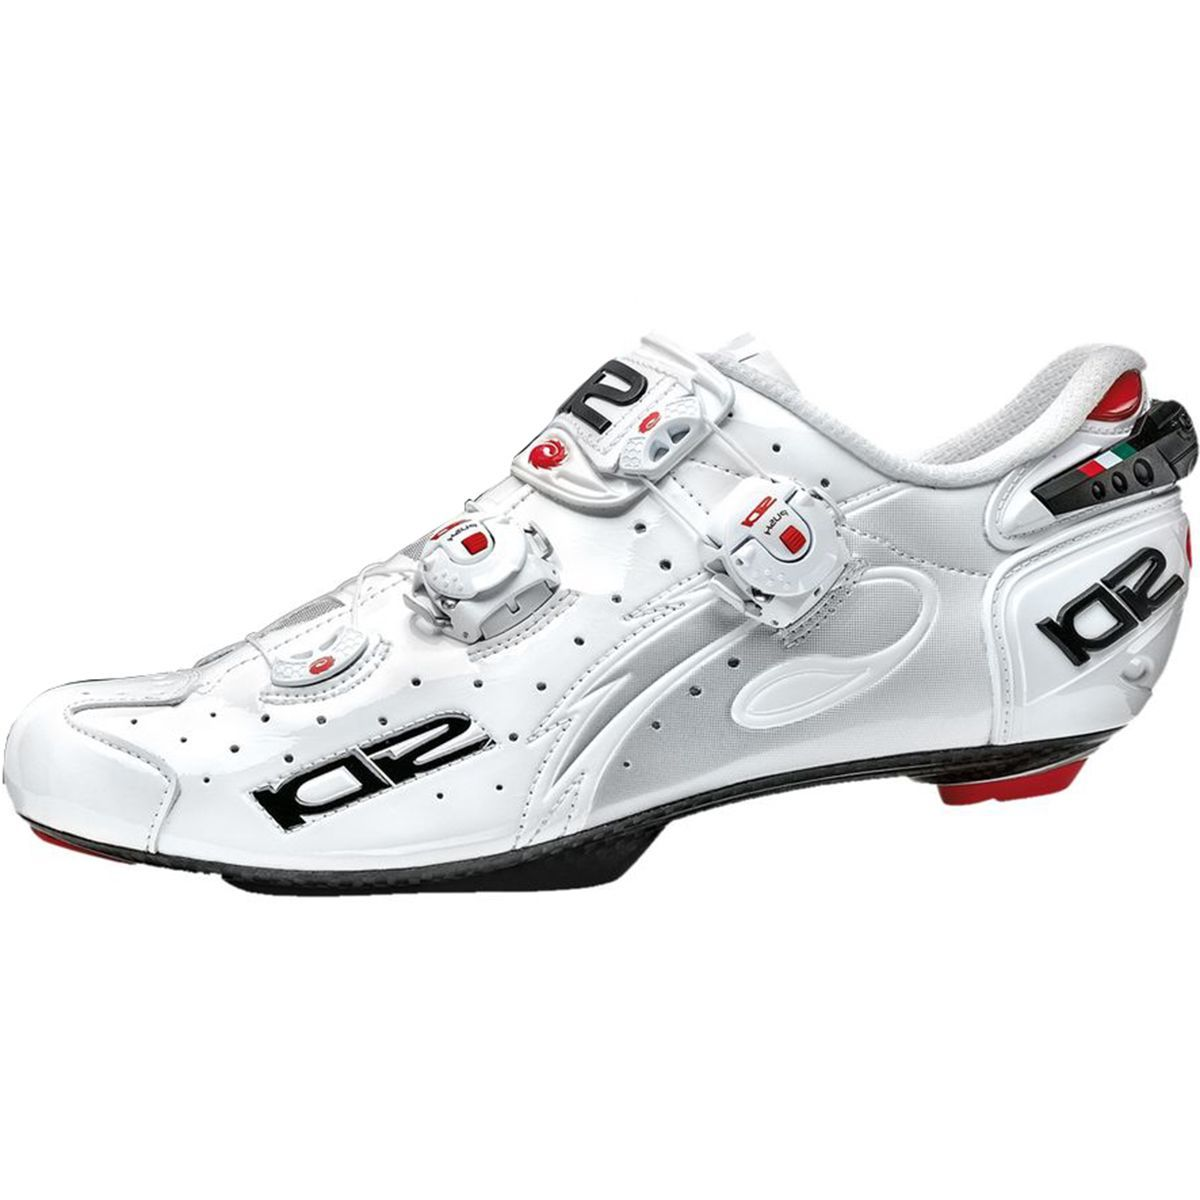 Sidi Wire Push Speedplay Cycling Shoe - Men's